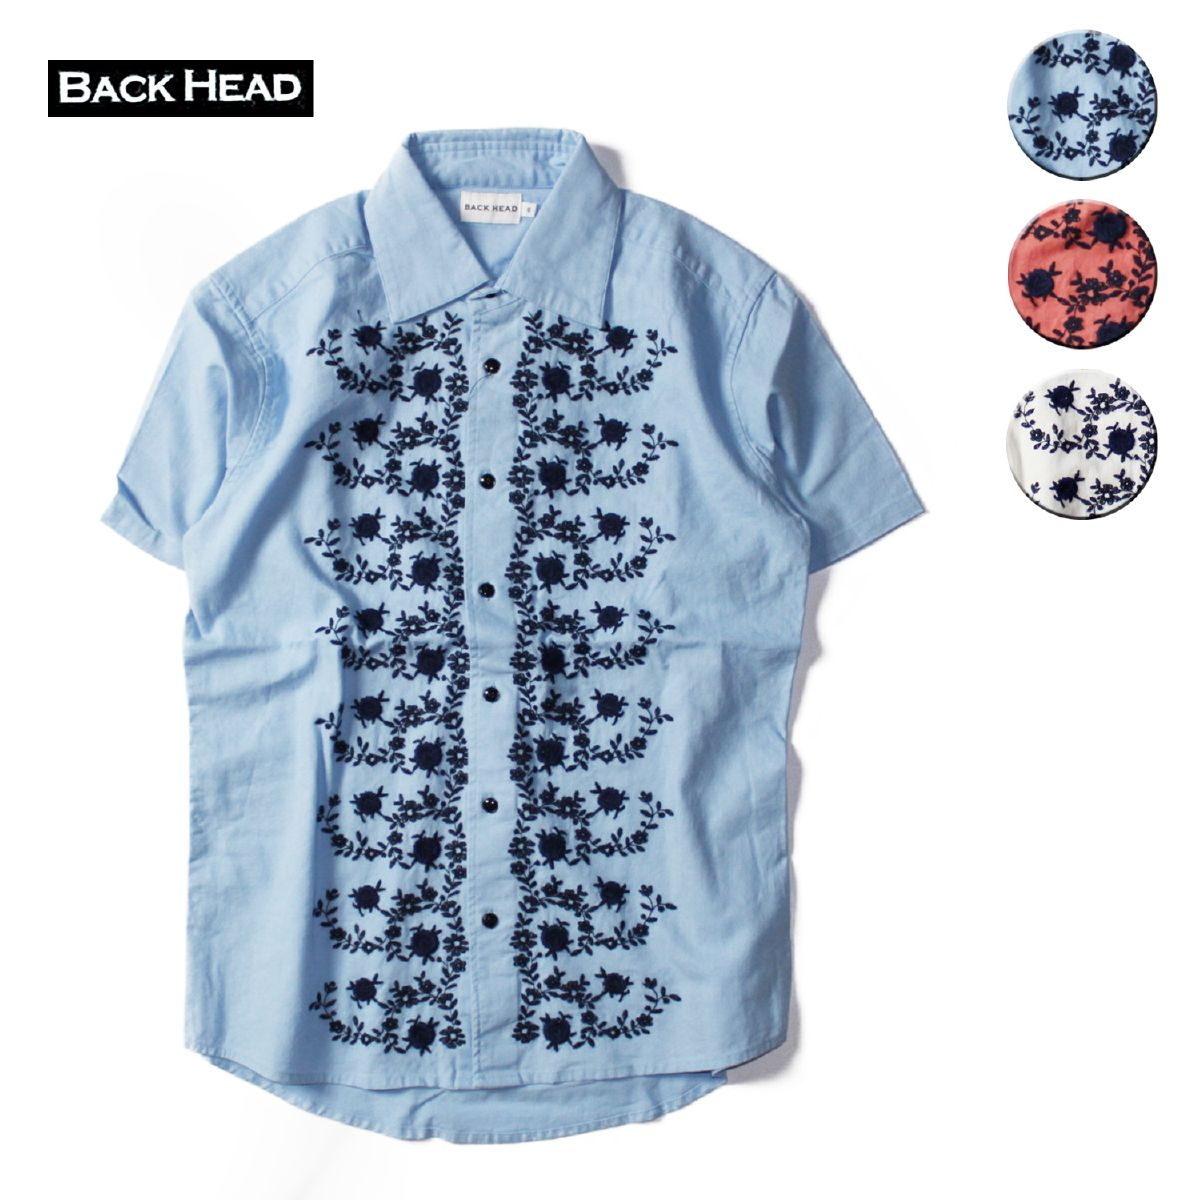 BACKHEAD シャツ 半袖シャツ カジュアルシャツ 半袖 リネン 刺繍 ブランド サーフ アメカジ 青 バックヘッド S-L 白 ホワイト 秀逸 メンズ サーモンピンク 刺繍シャツ ブルー BACK お気に入り HEAD